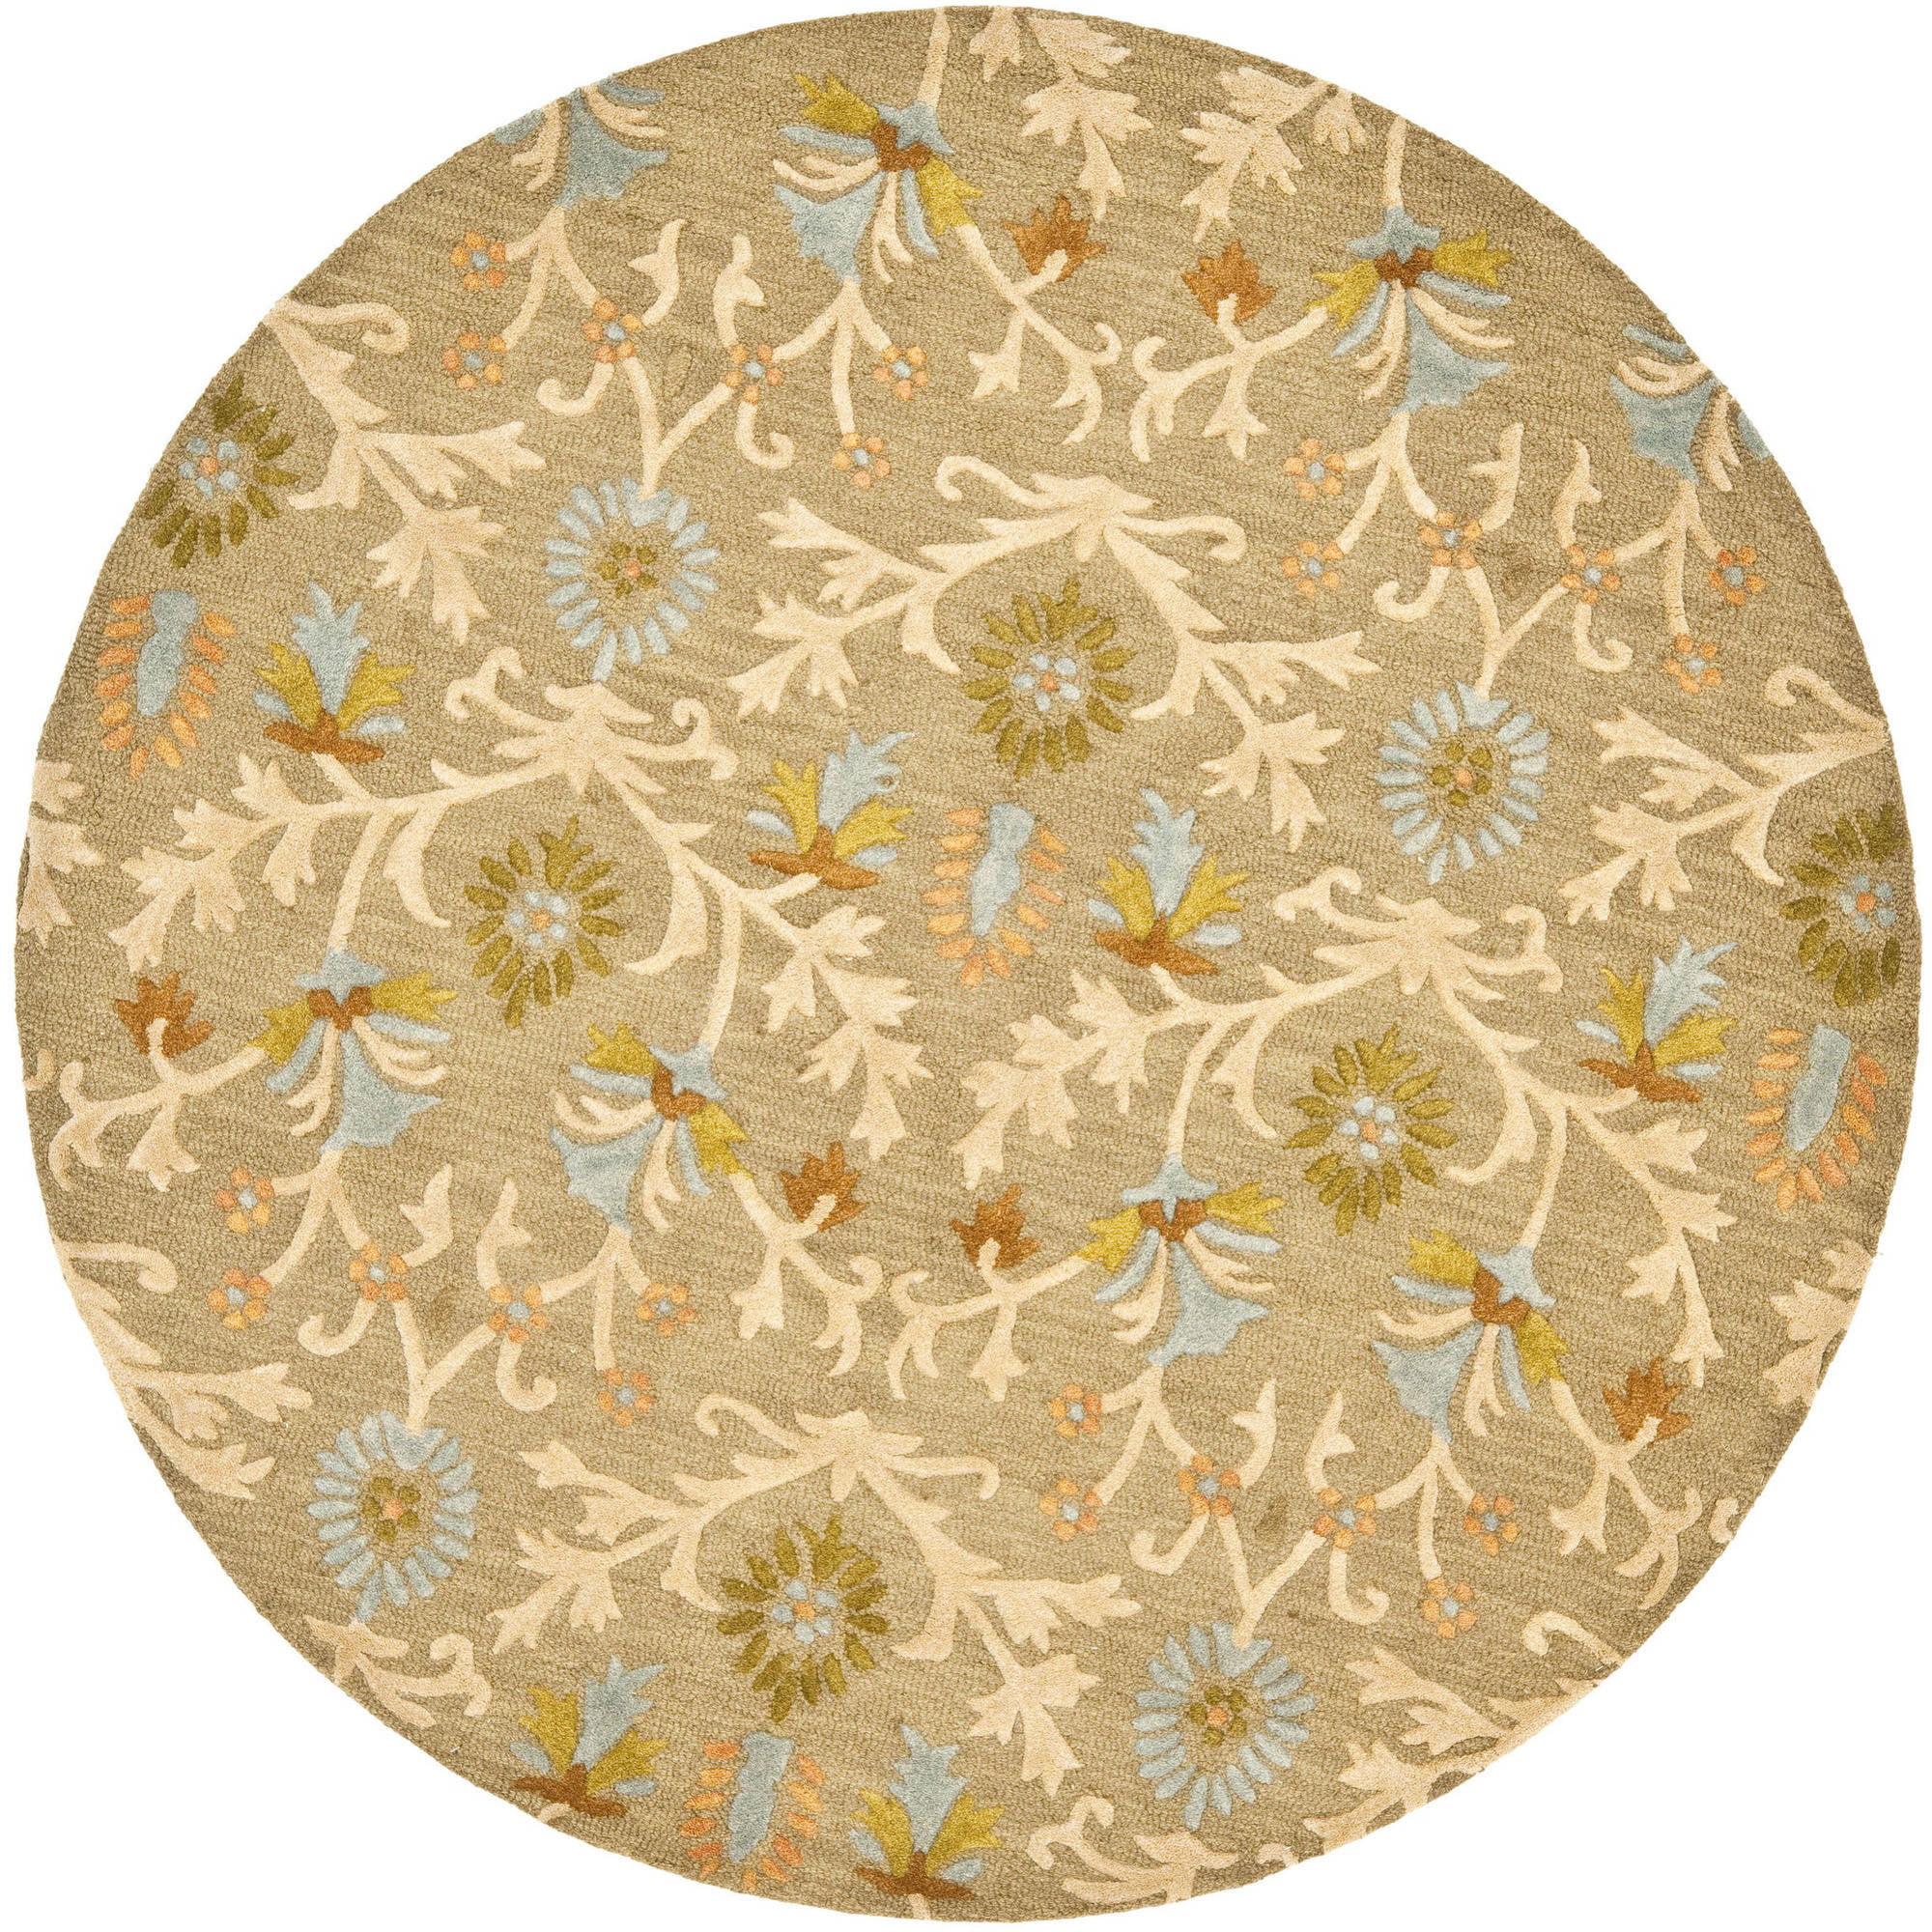 Safavieh Cambridge Jone Welsh Wool Pile Area Rug, Moss/Multi